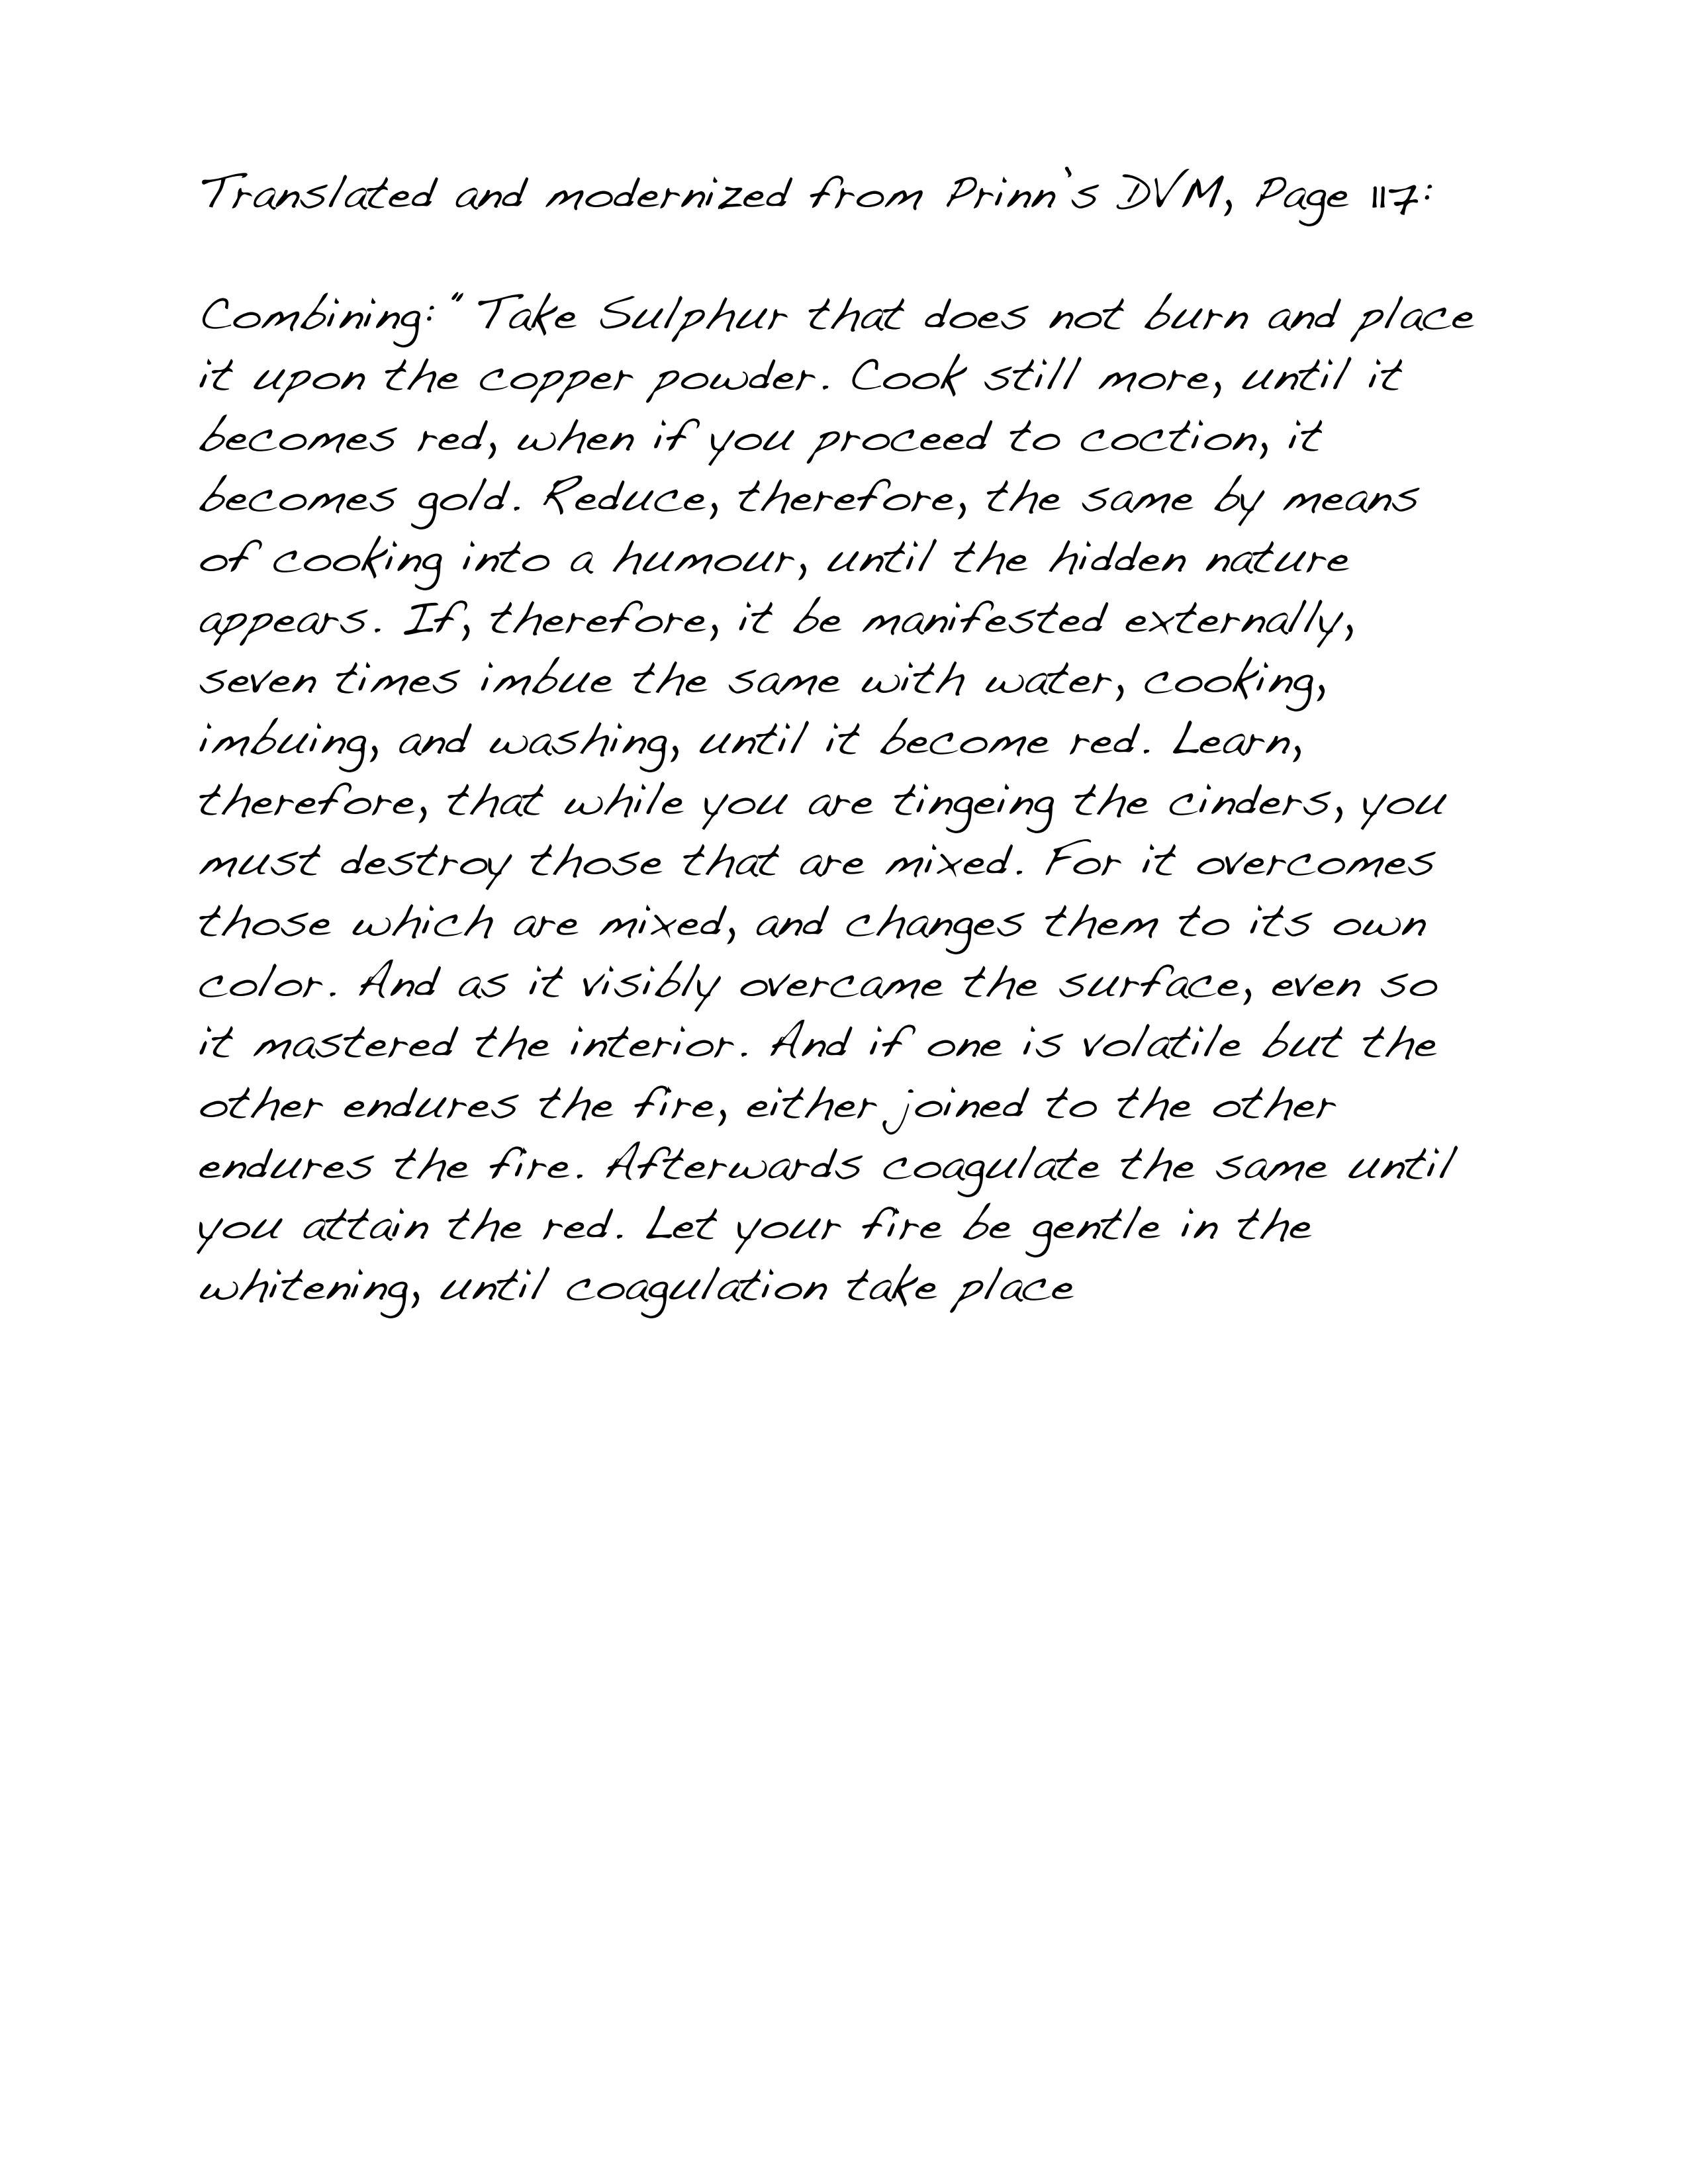 De vermis mysteriis page 7